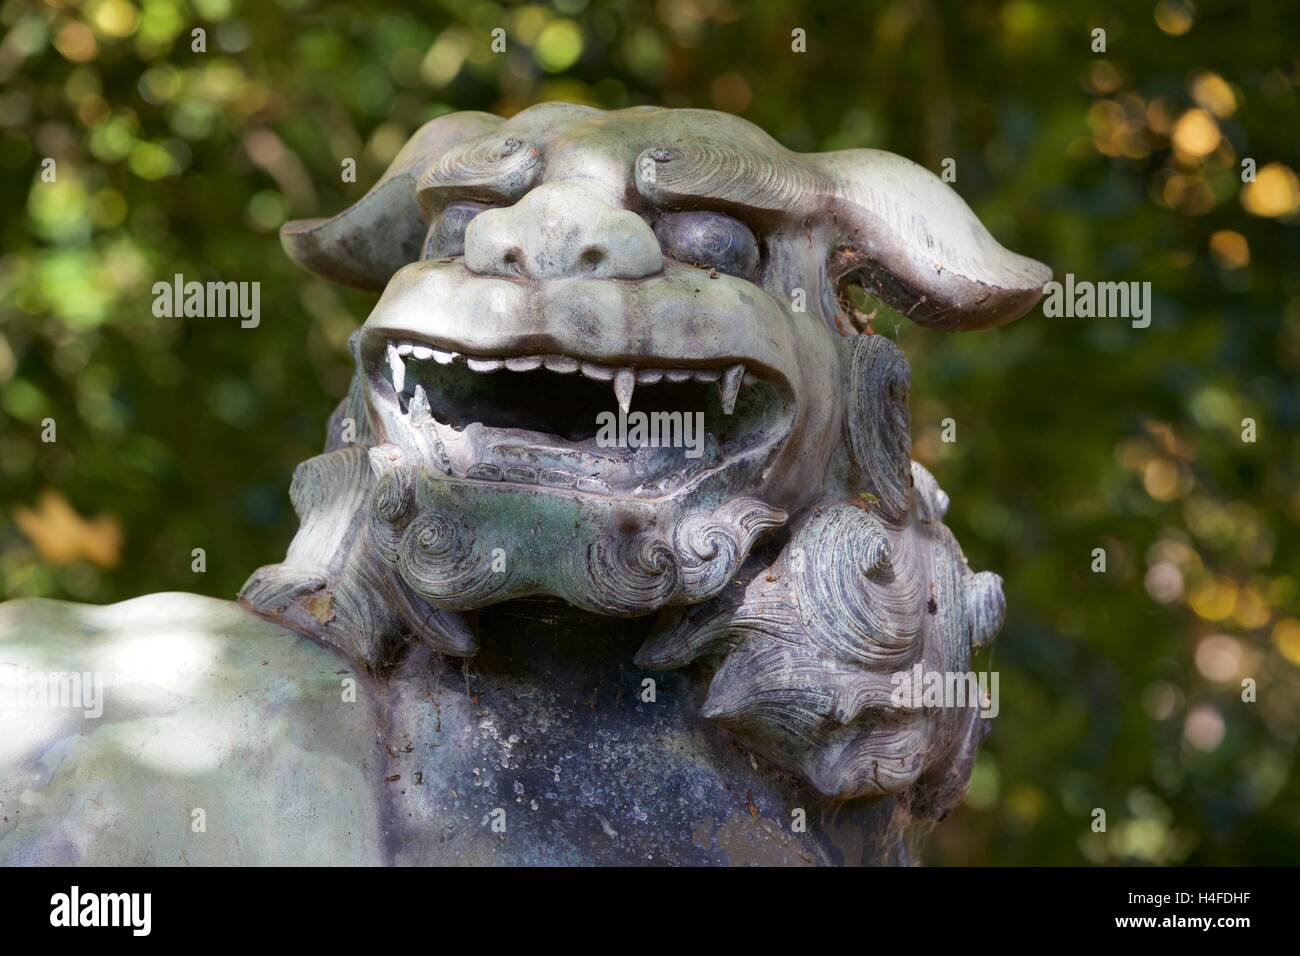 Foo Dog statue in Batsford Arboretum - Stock Image